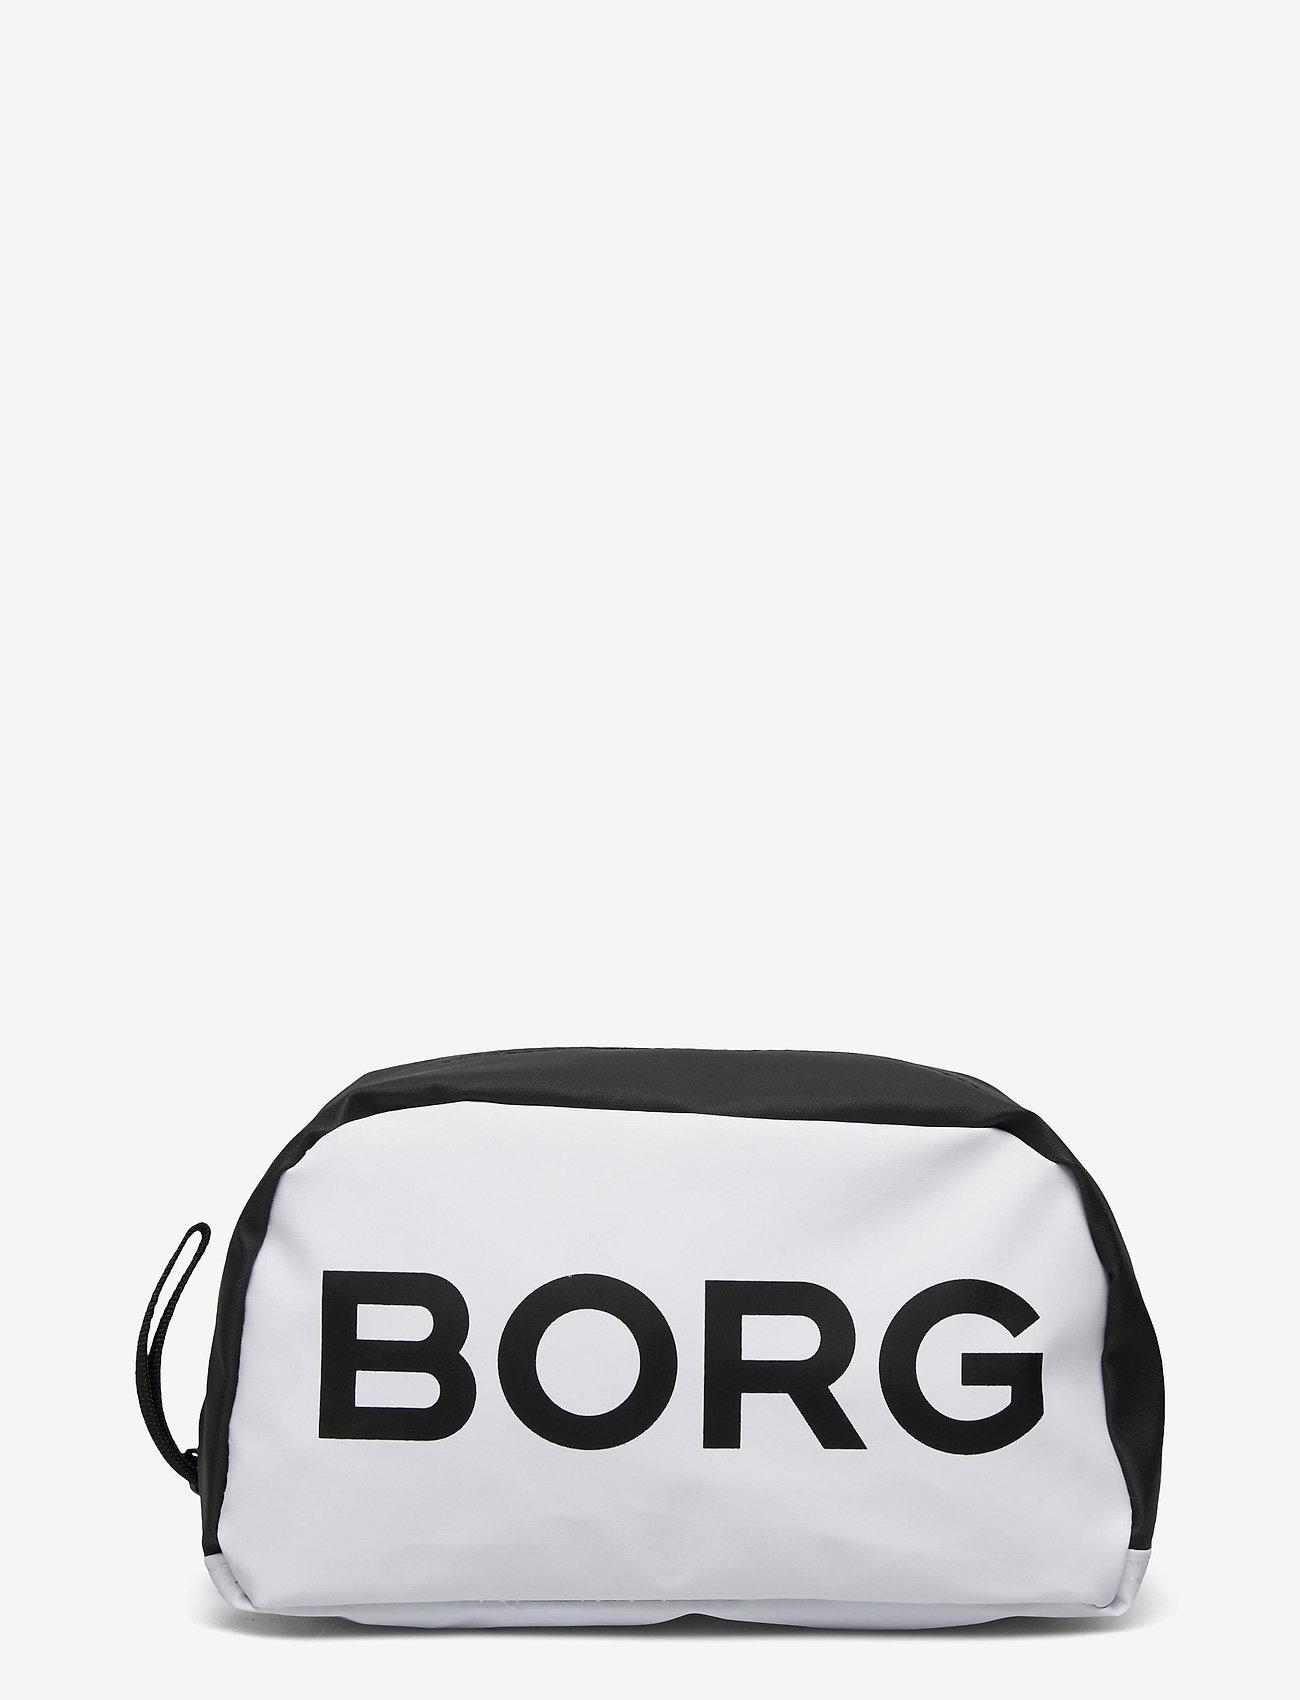 Björn Borg - BORG TOILET CASE - toilettassen - white - 0